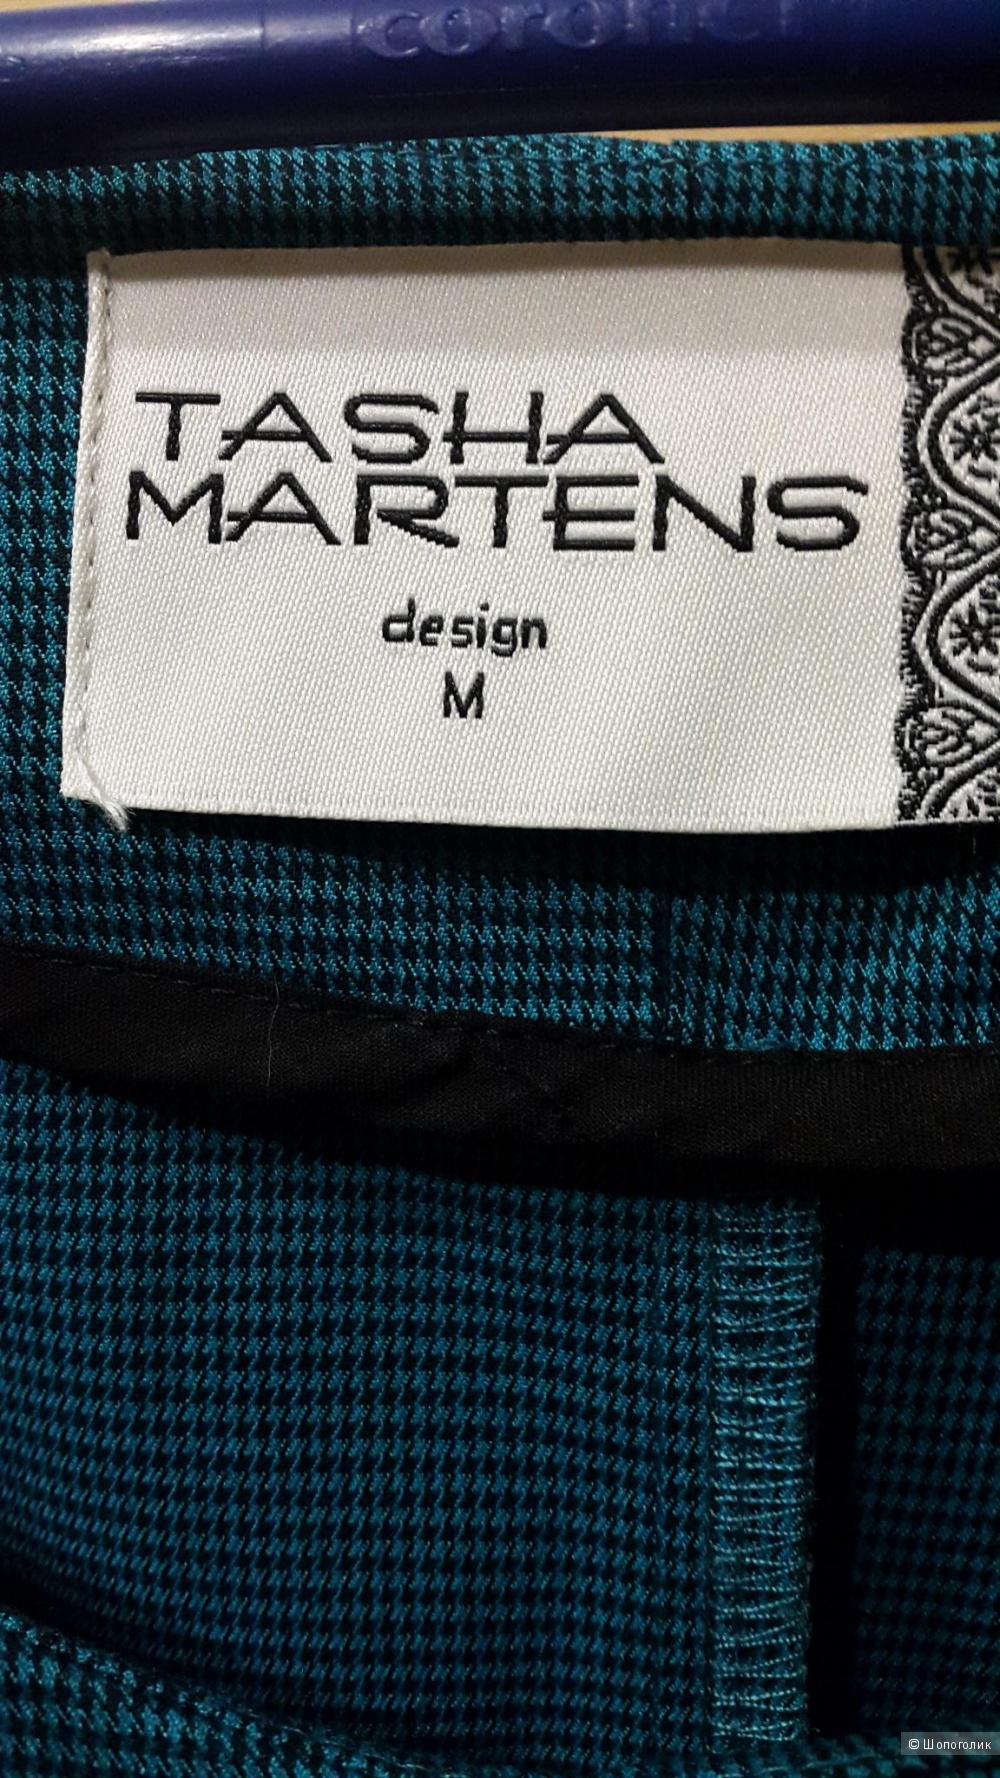 Платье Tasha Martens. Размер М.